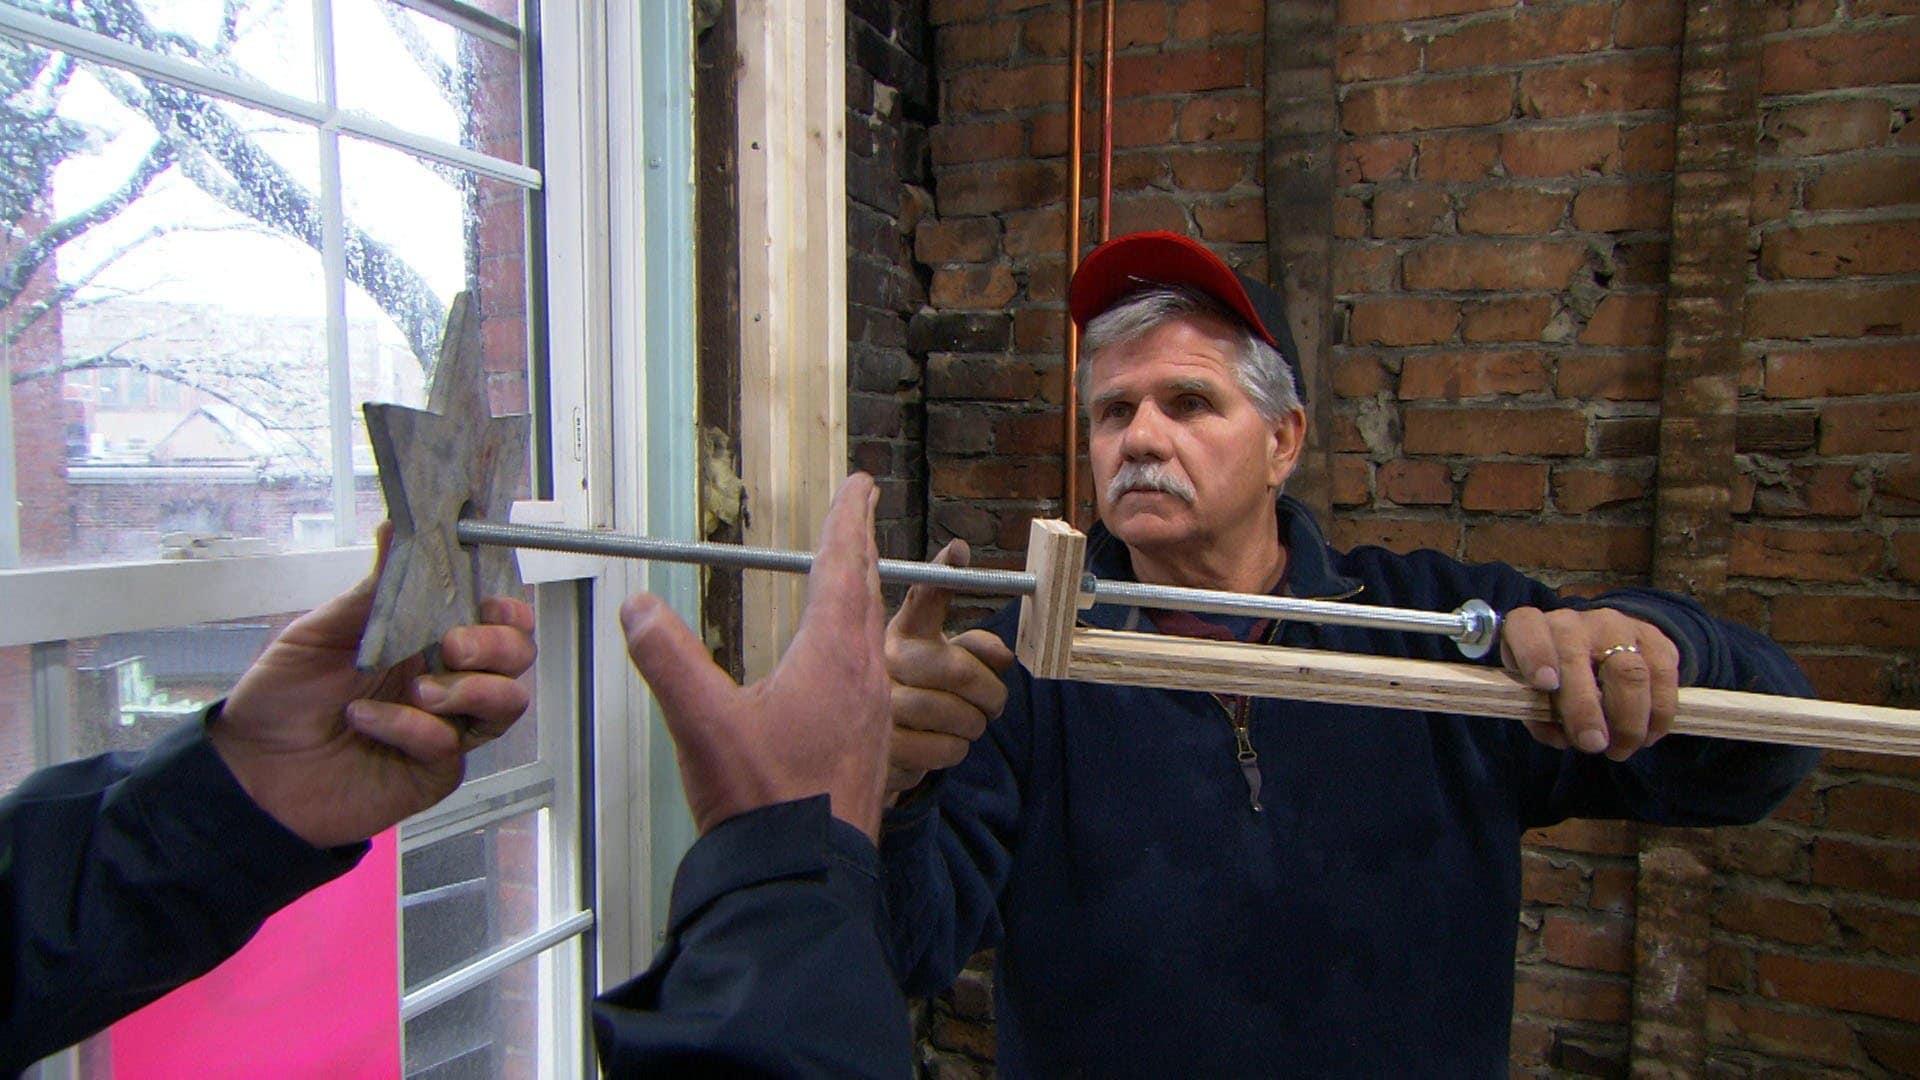 Charlestown 2014: Brick Rowhouse Blues